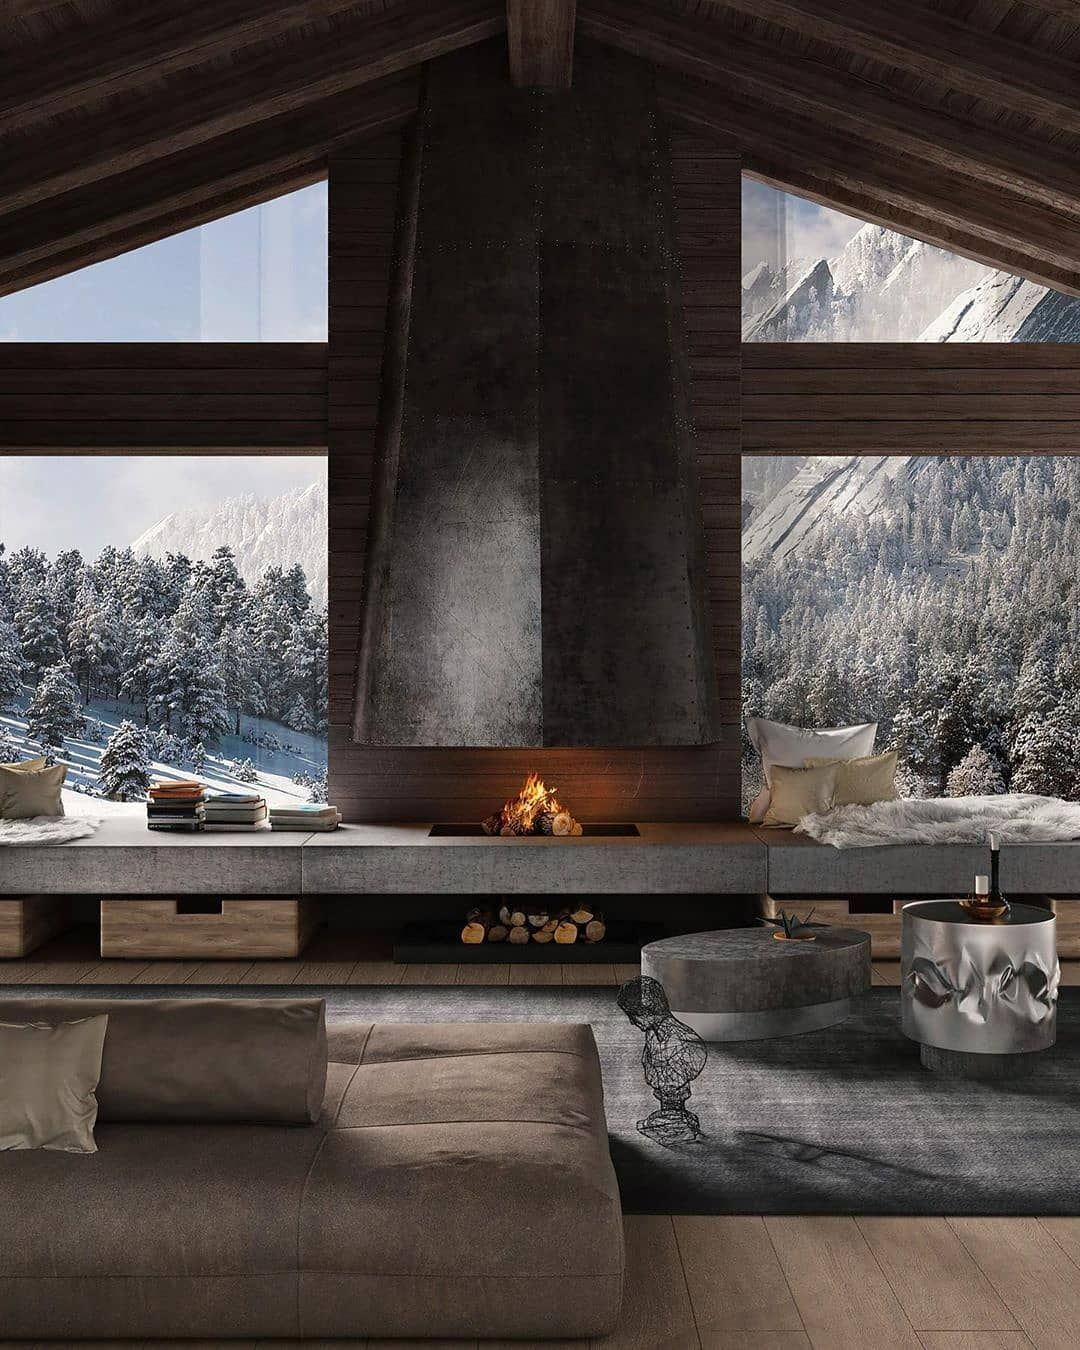 Interior Design Inspiration On Instagram Homeinteriordaily Chalet Style By Elizaveta Meleshenya Follow Homei In 2020 Fireplace Design Architecture Chalet Style